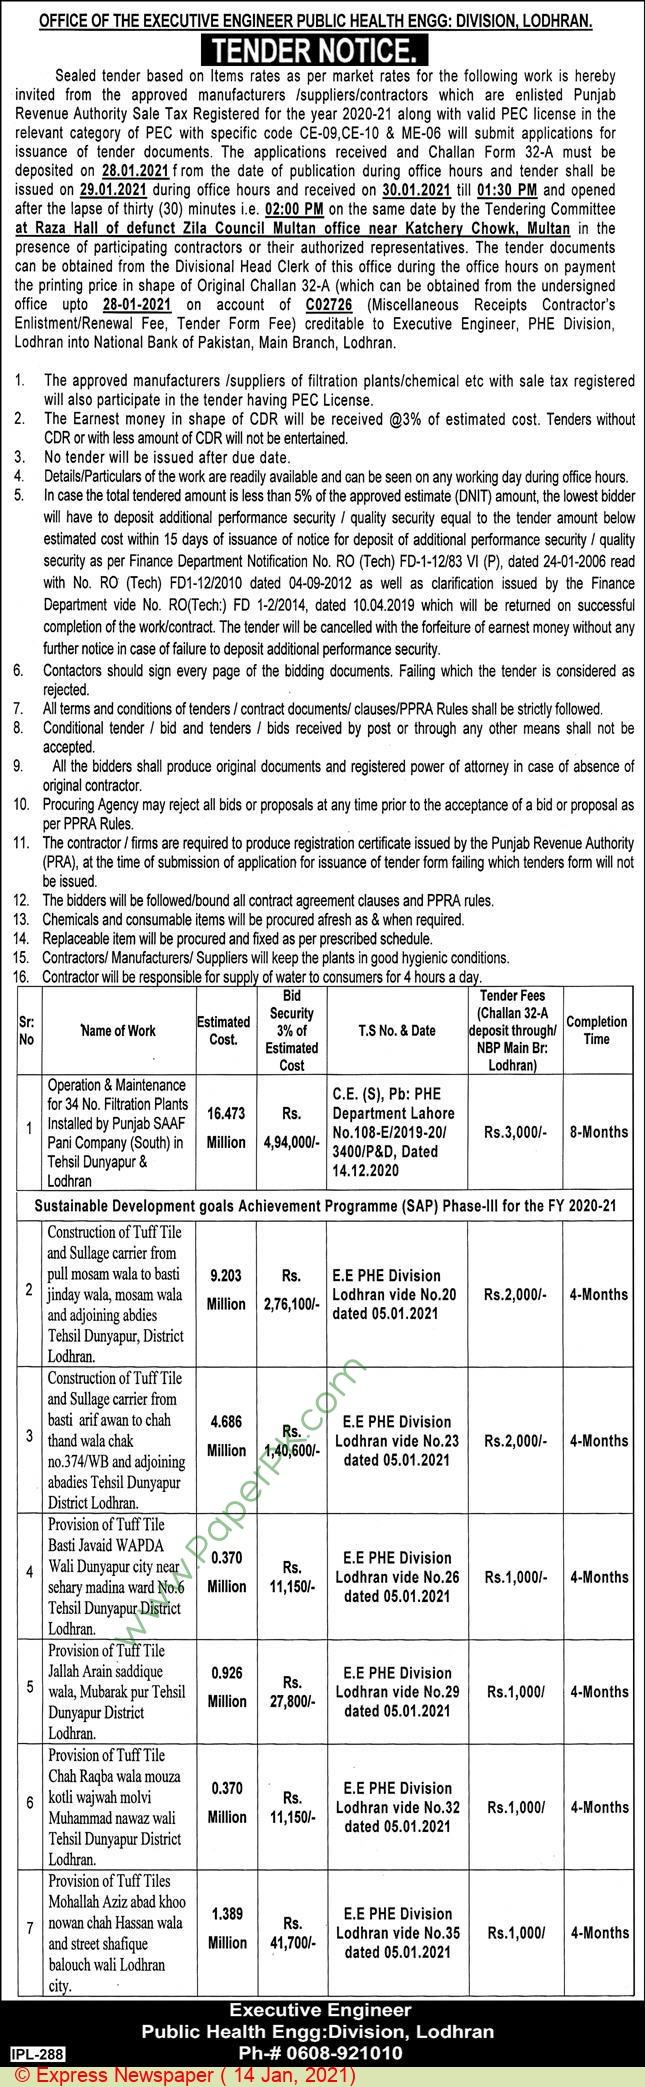 Public Health Engineering Division Lodhran Tender Notice